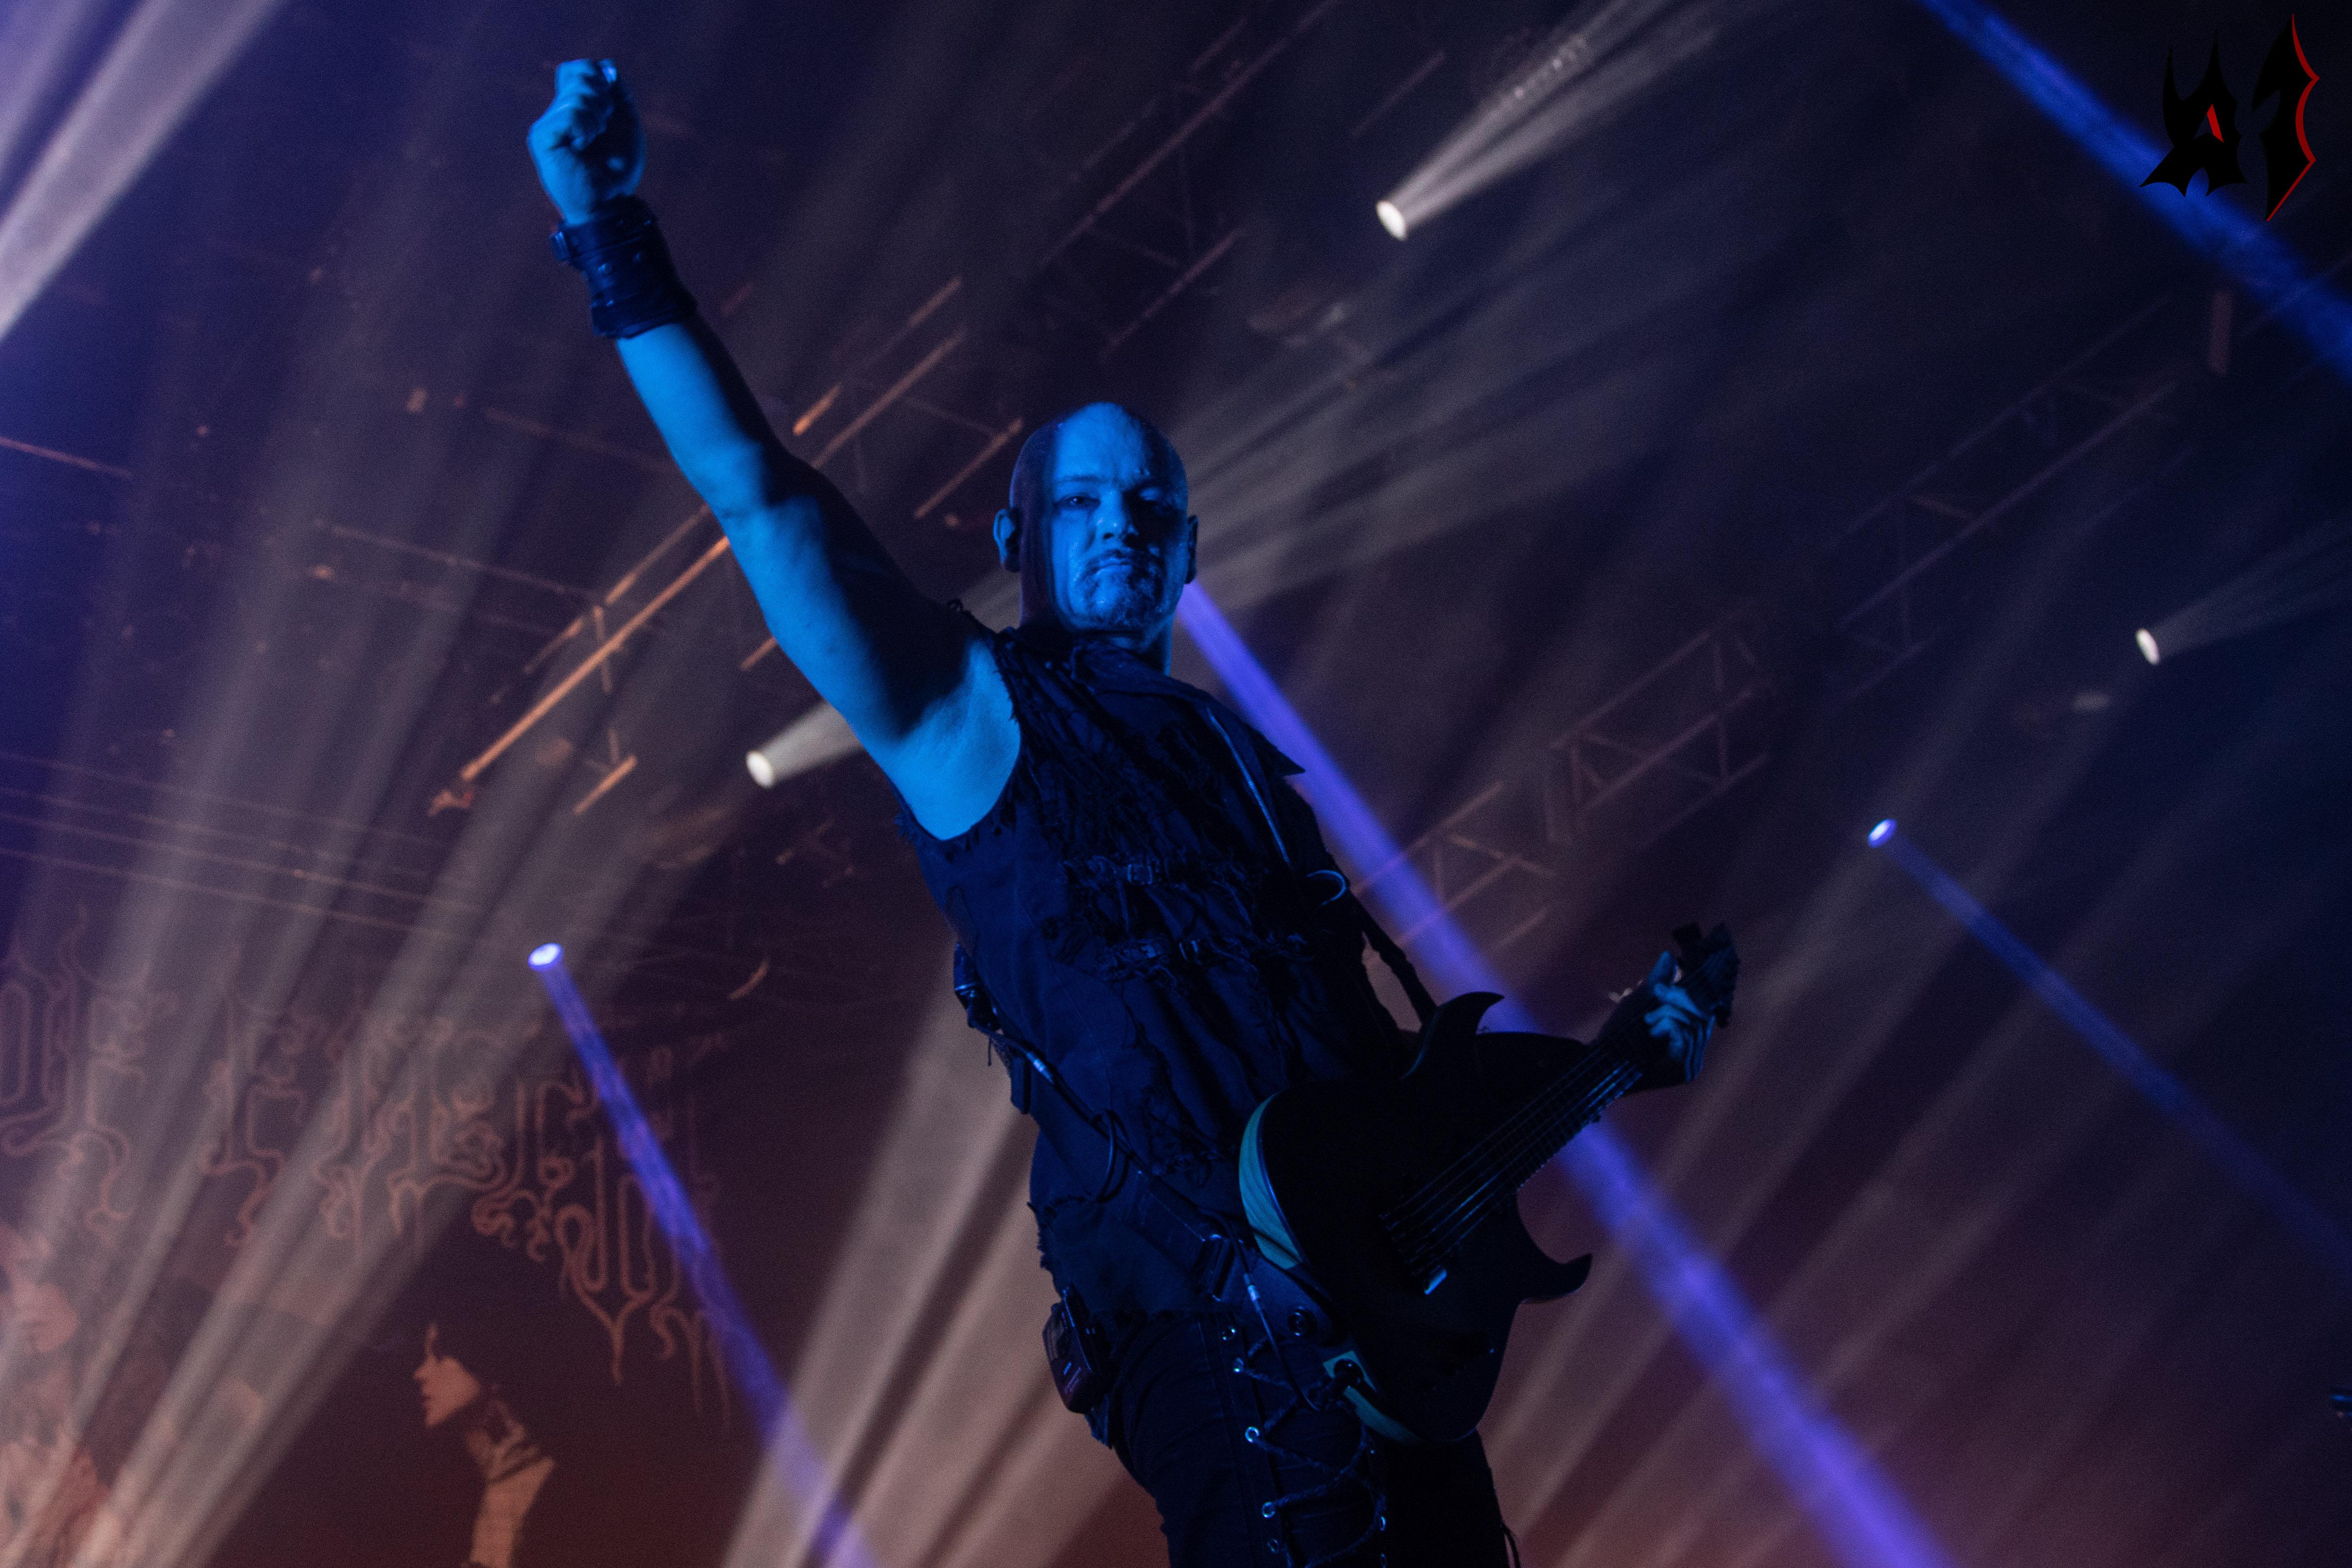 Hellfest - Cradle Of Filth - 30